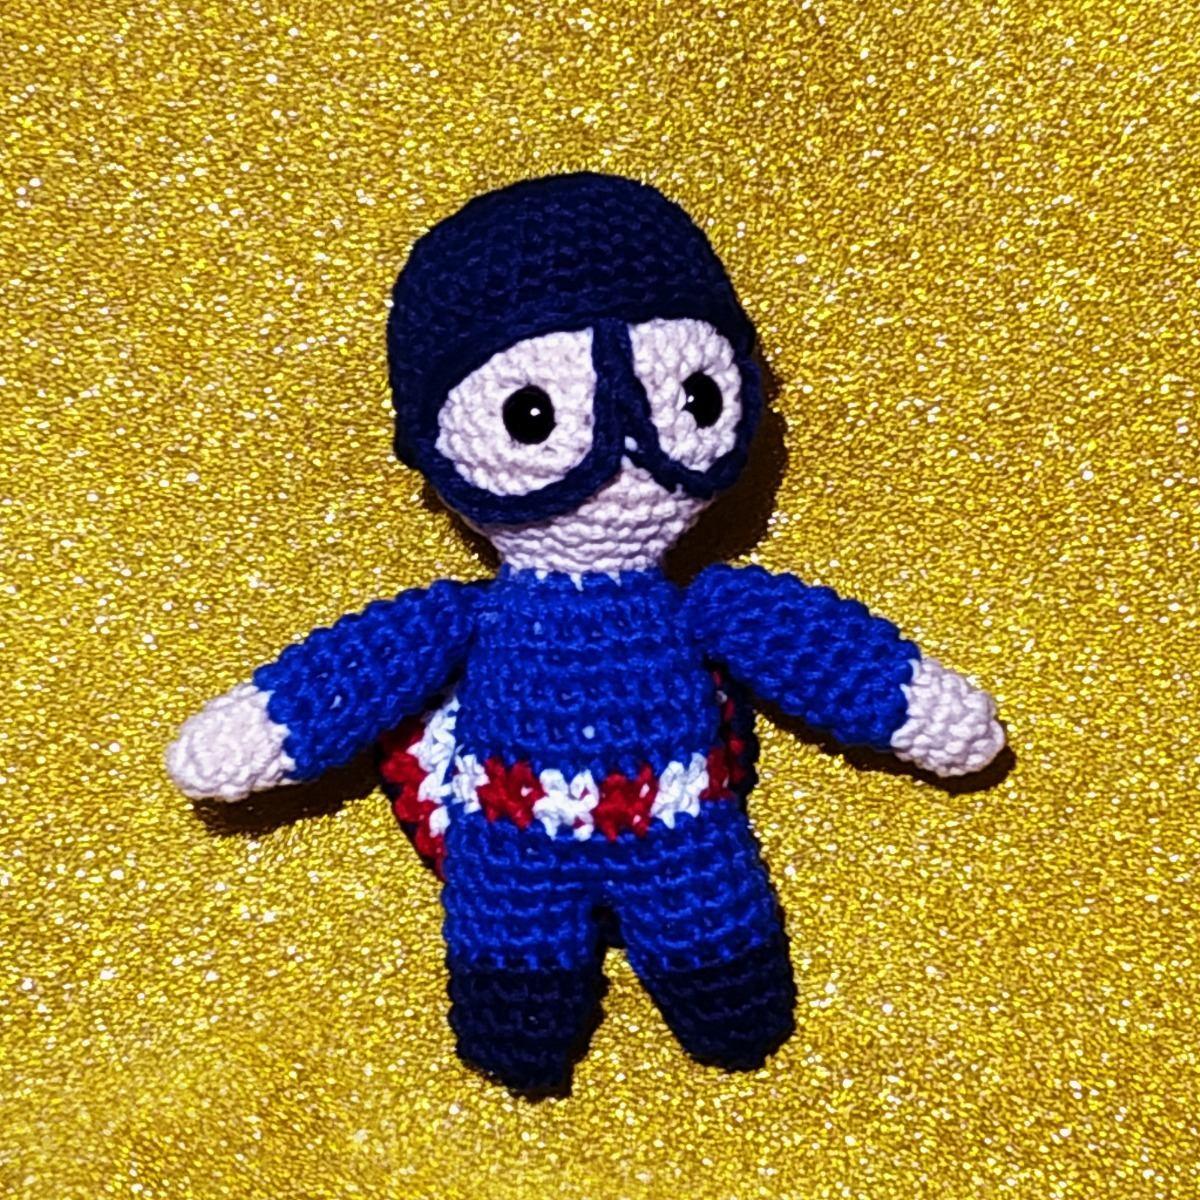 Amigurumi Captain America Pattern | Amigurumi | Crochet | Free 30 ... | 1200x1200